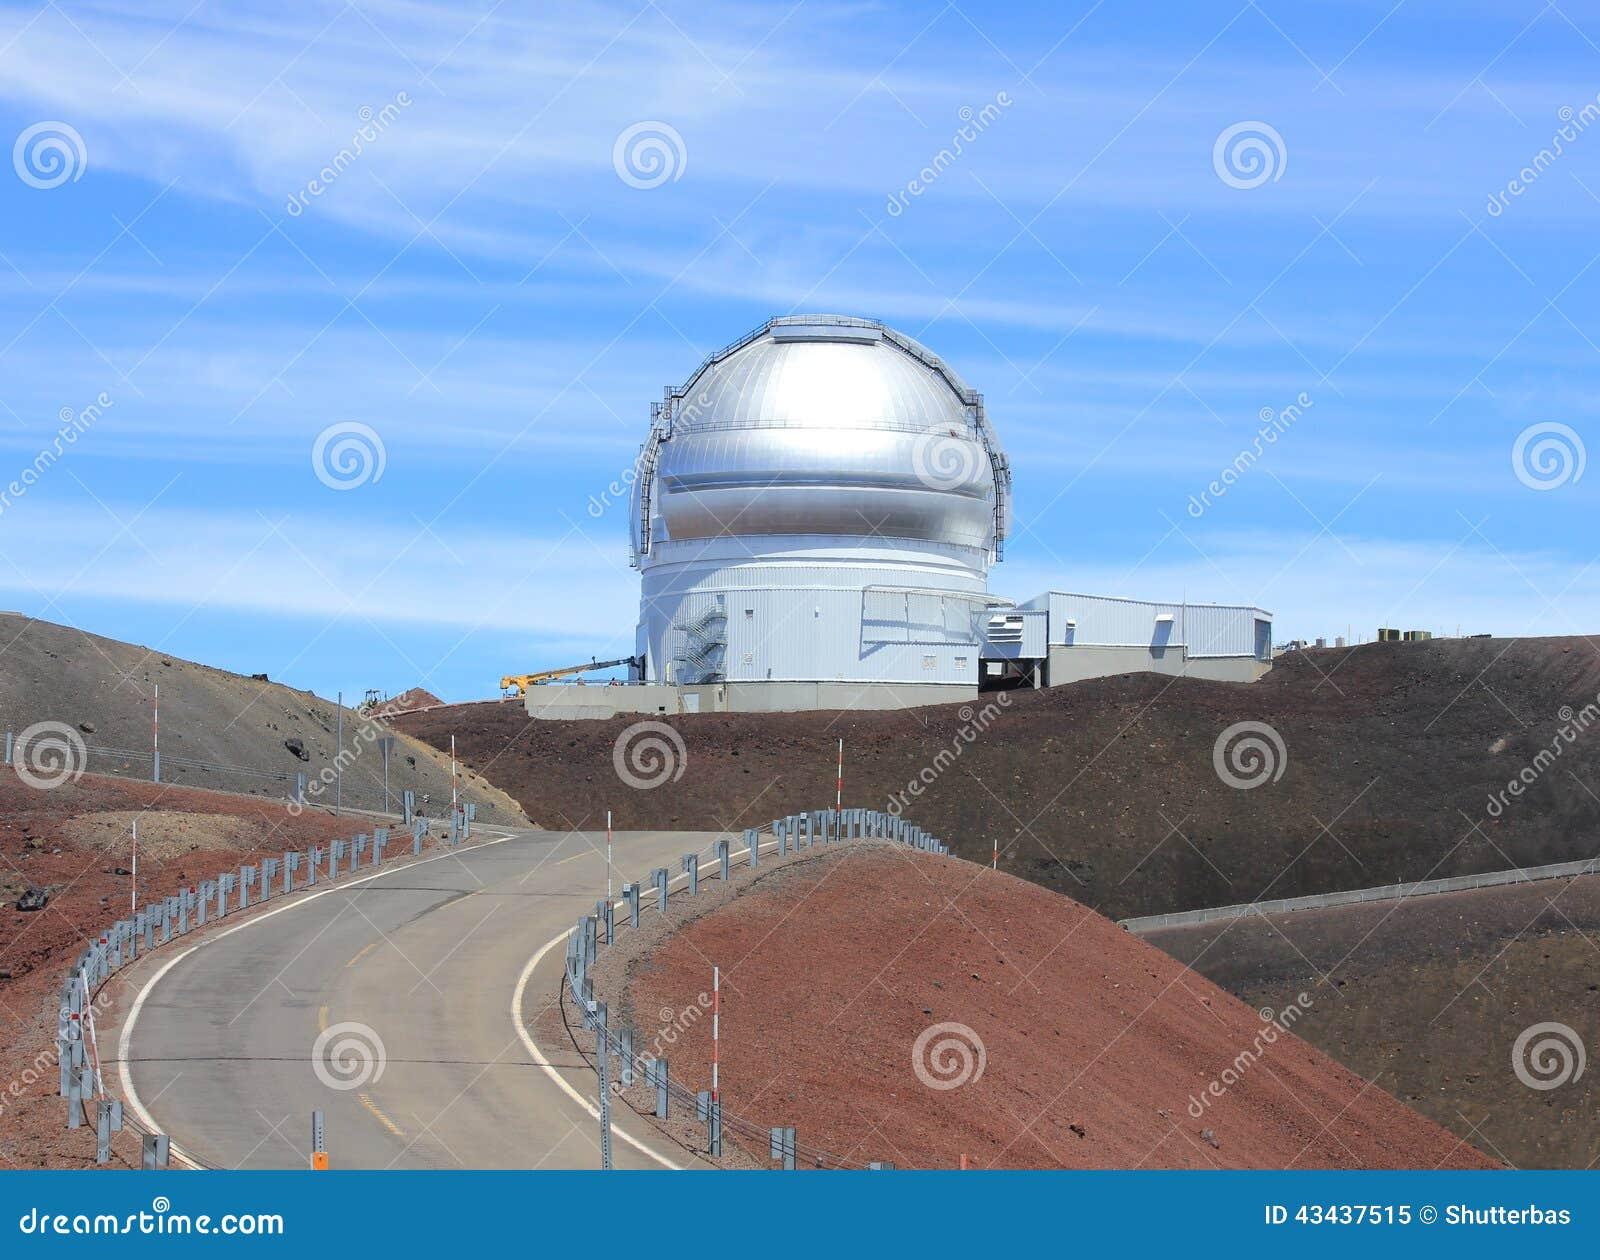 Hawaii Observatory Stock Photo - Image: 43437515